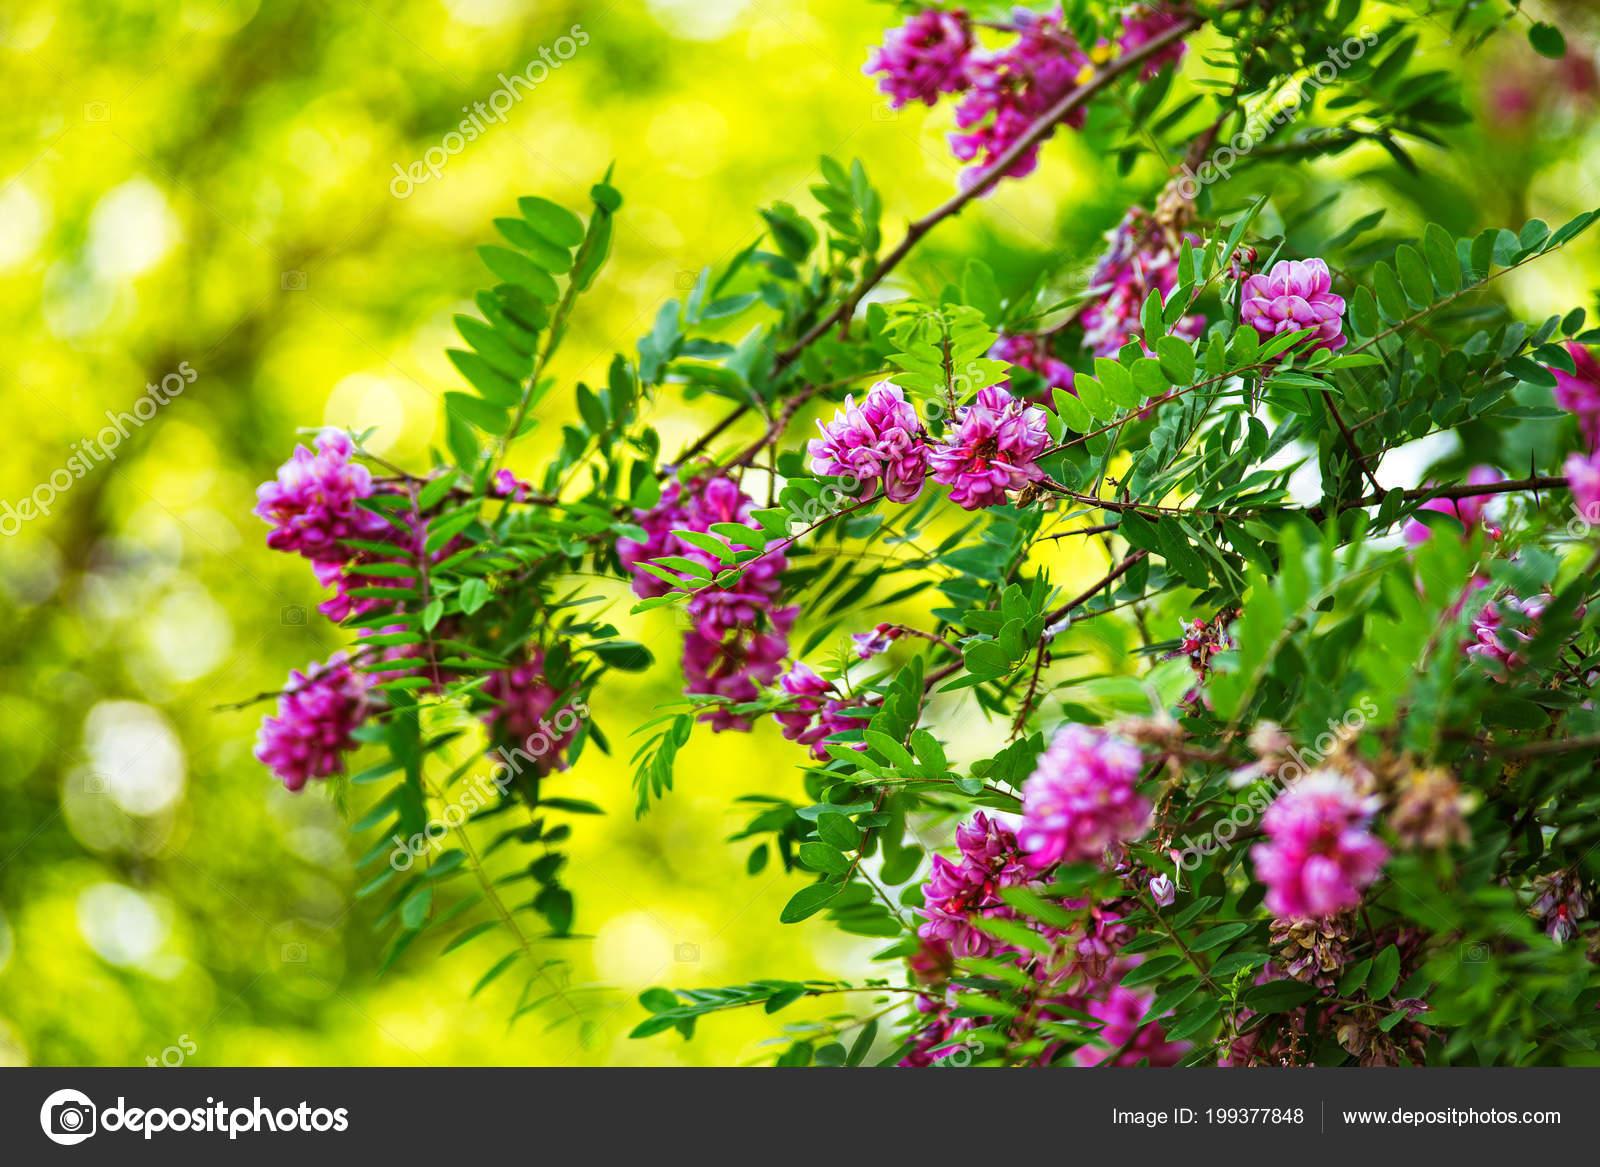 Purple acacia tree blooming background pink robinia flowers close purple acacia tree blooming background pink robinia flowers close violet stock photo mightylinksfo